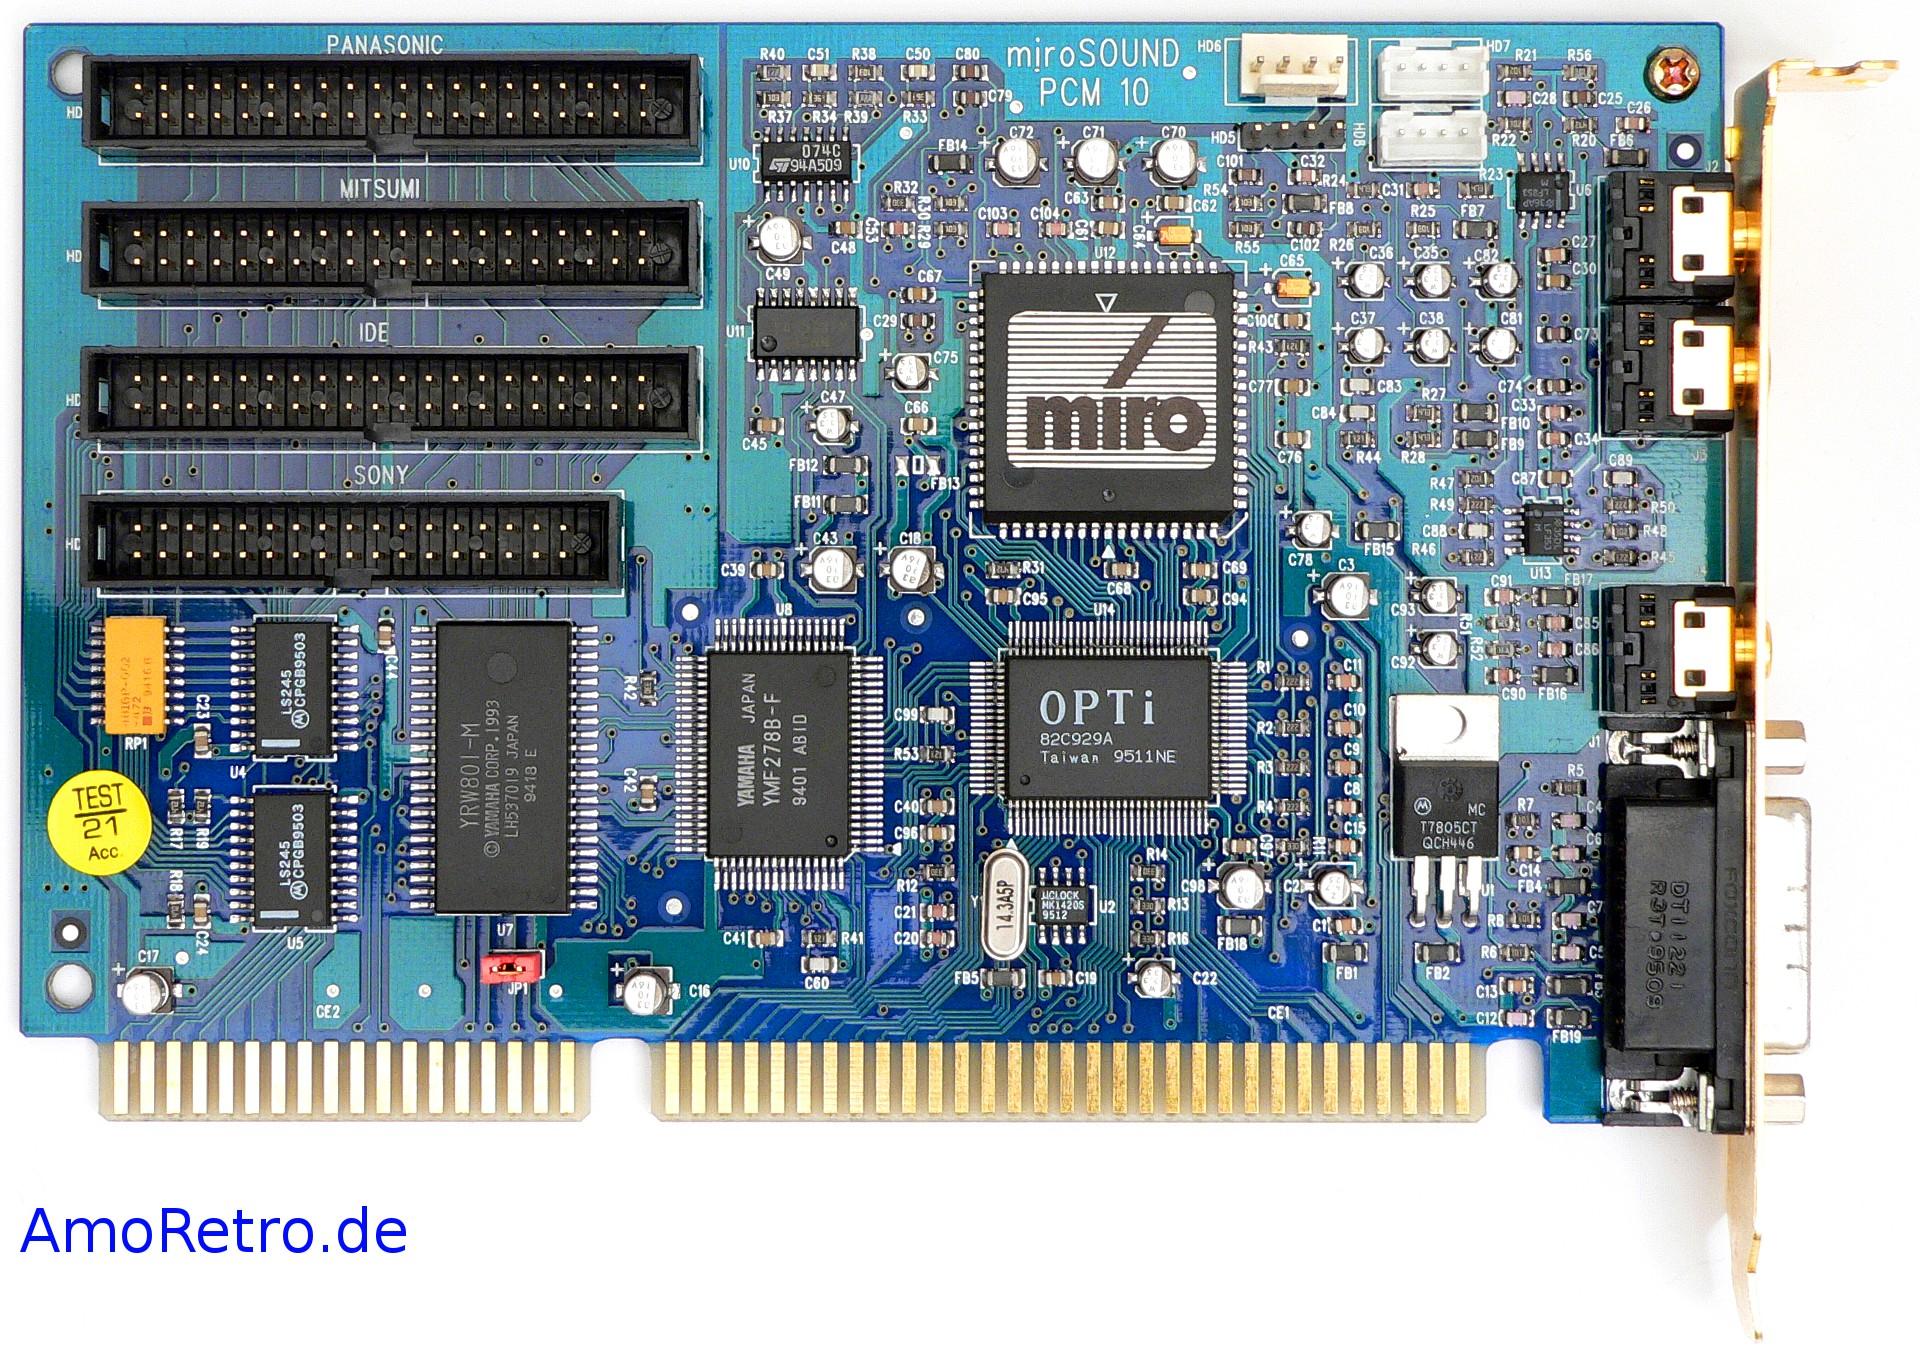 miro_sound_pcm_10_opl4_isa_soundkarte.jpg